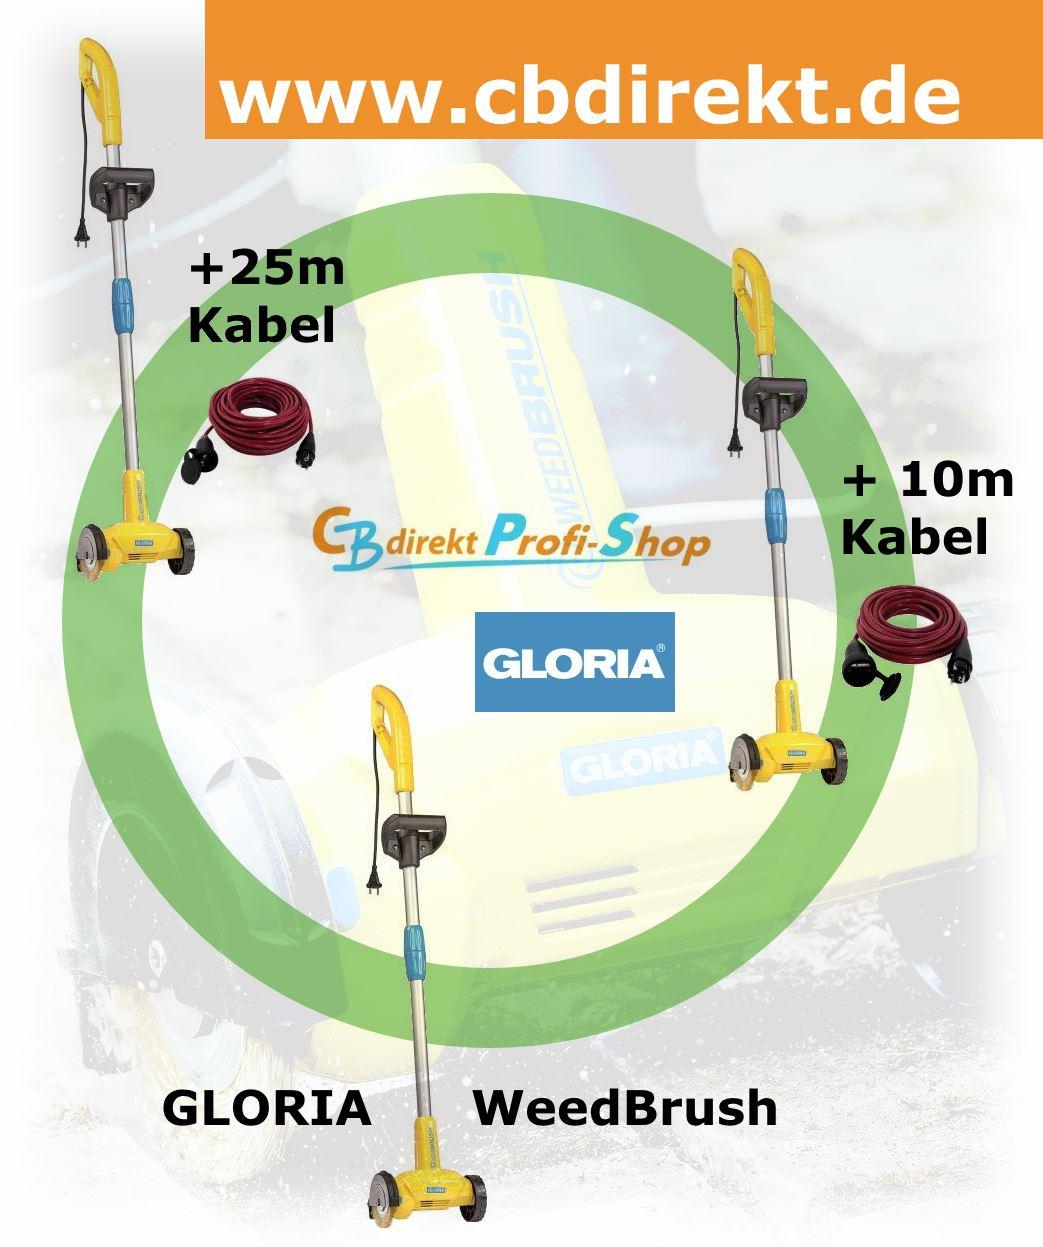 GLORIA WeedBrush Unkrautbürste @ CBdirekt Profi Shop